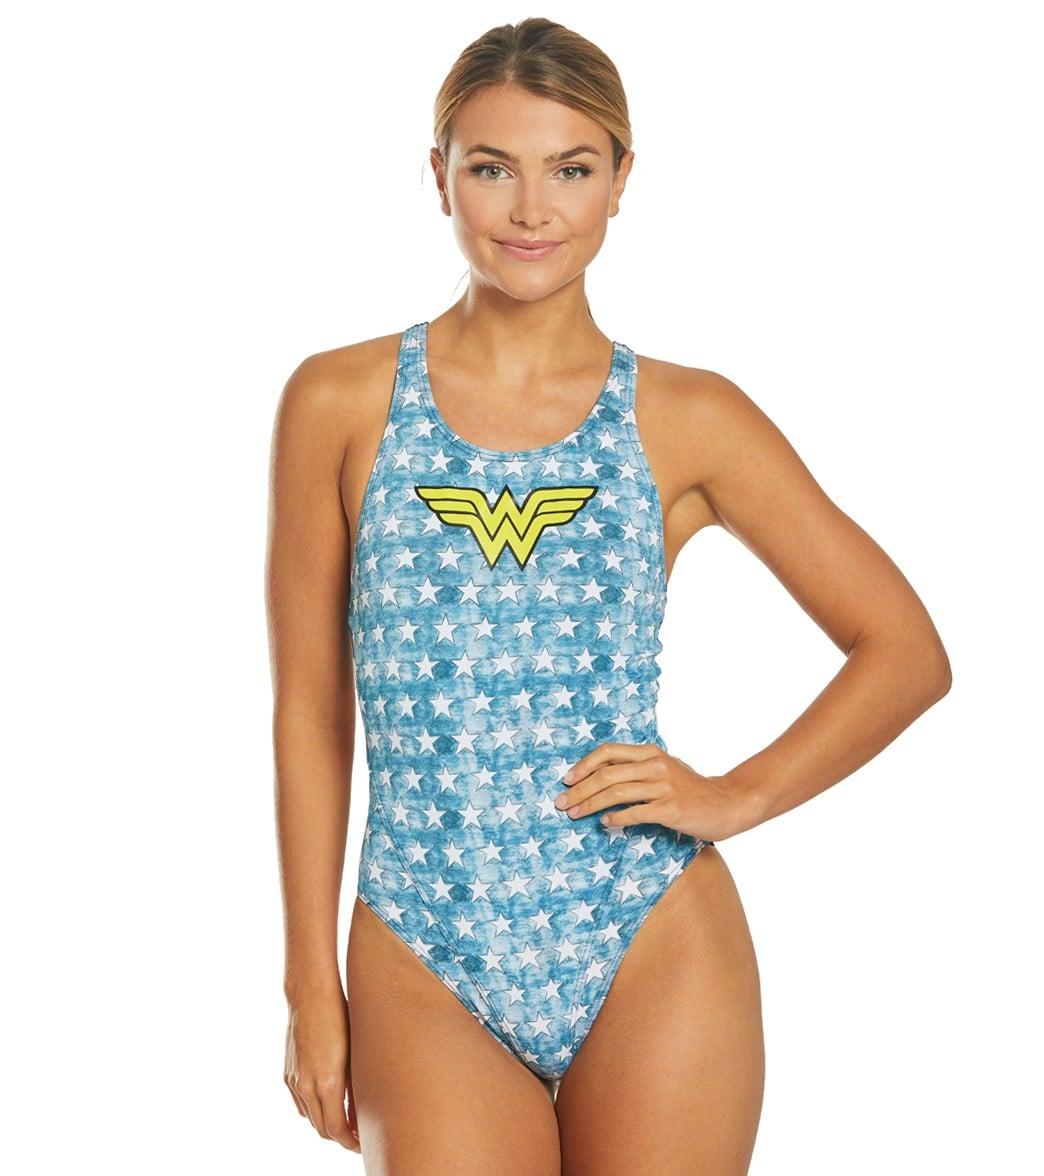 Arena Womens WB Wonder Woman Face Swim Pro Back One Piece Swimsuit